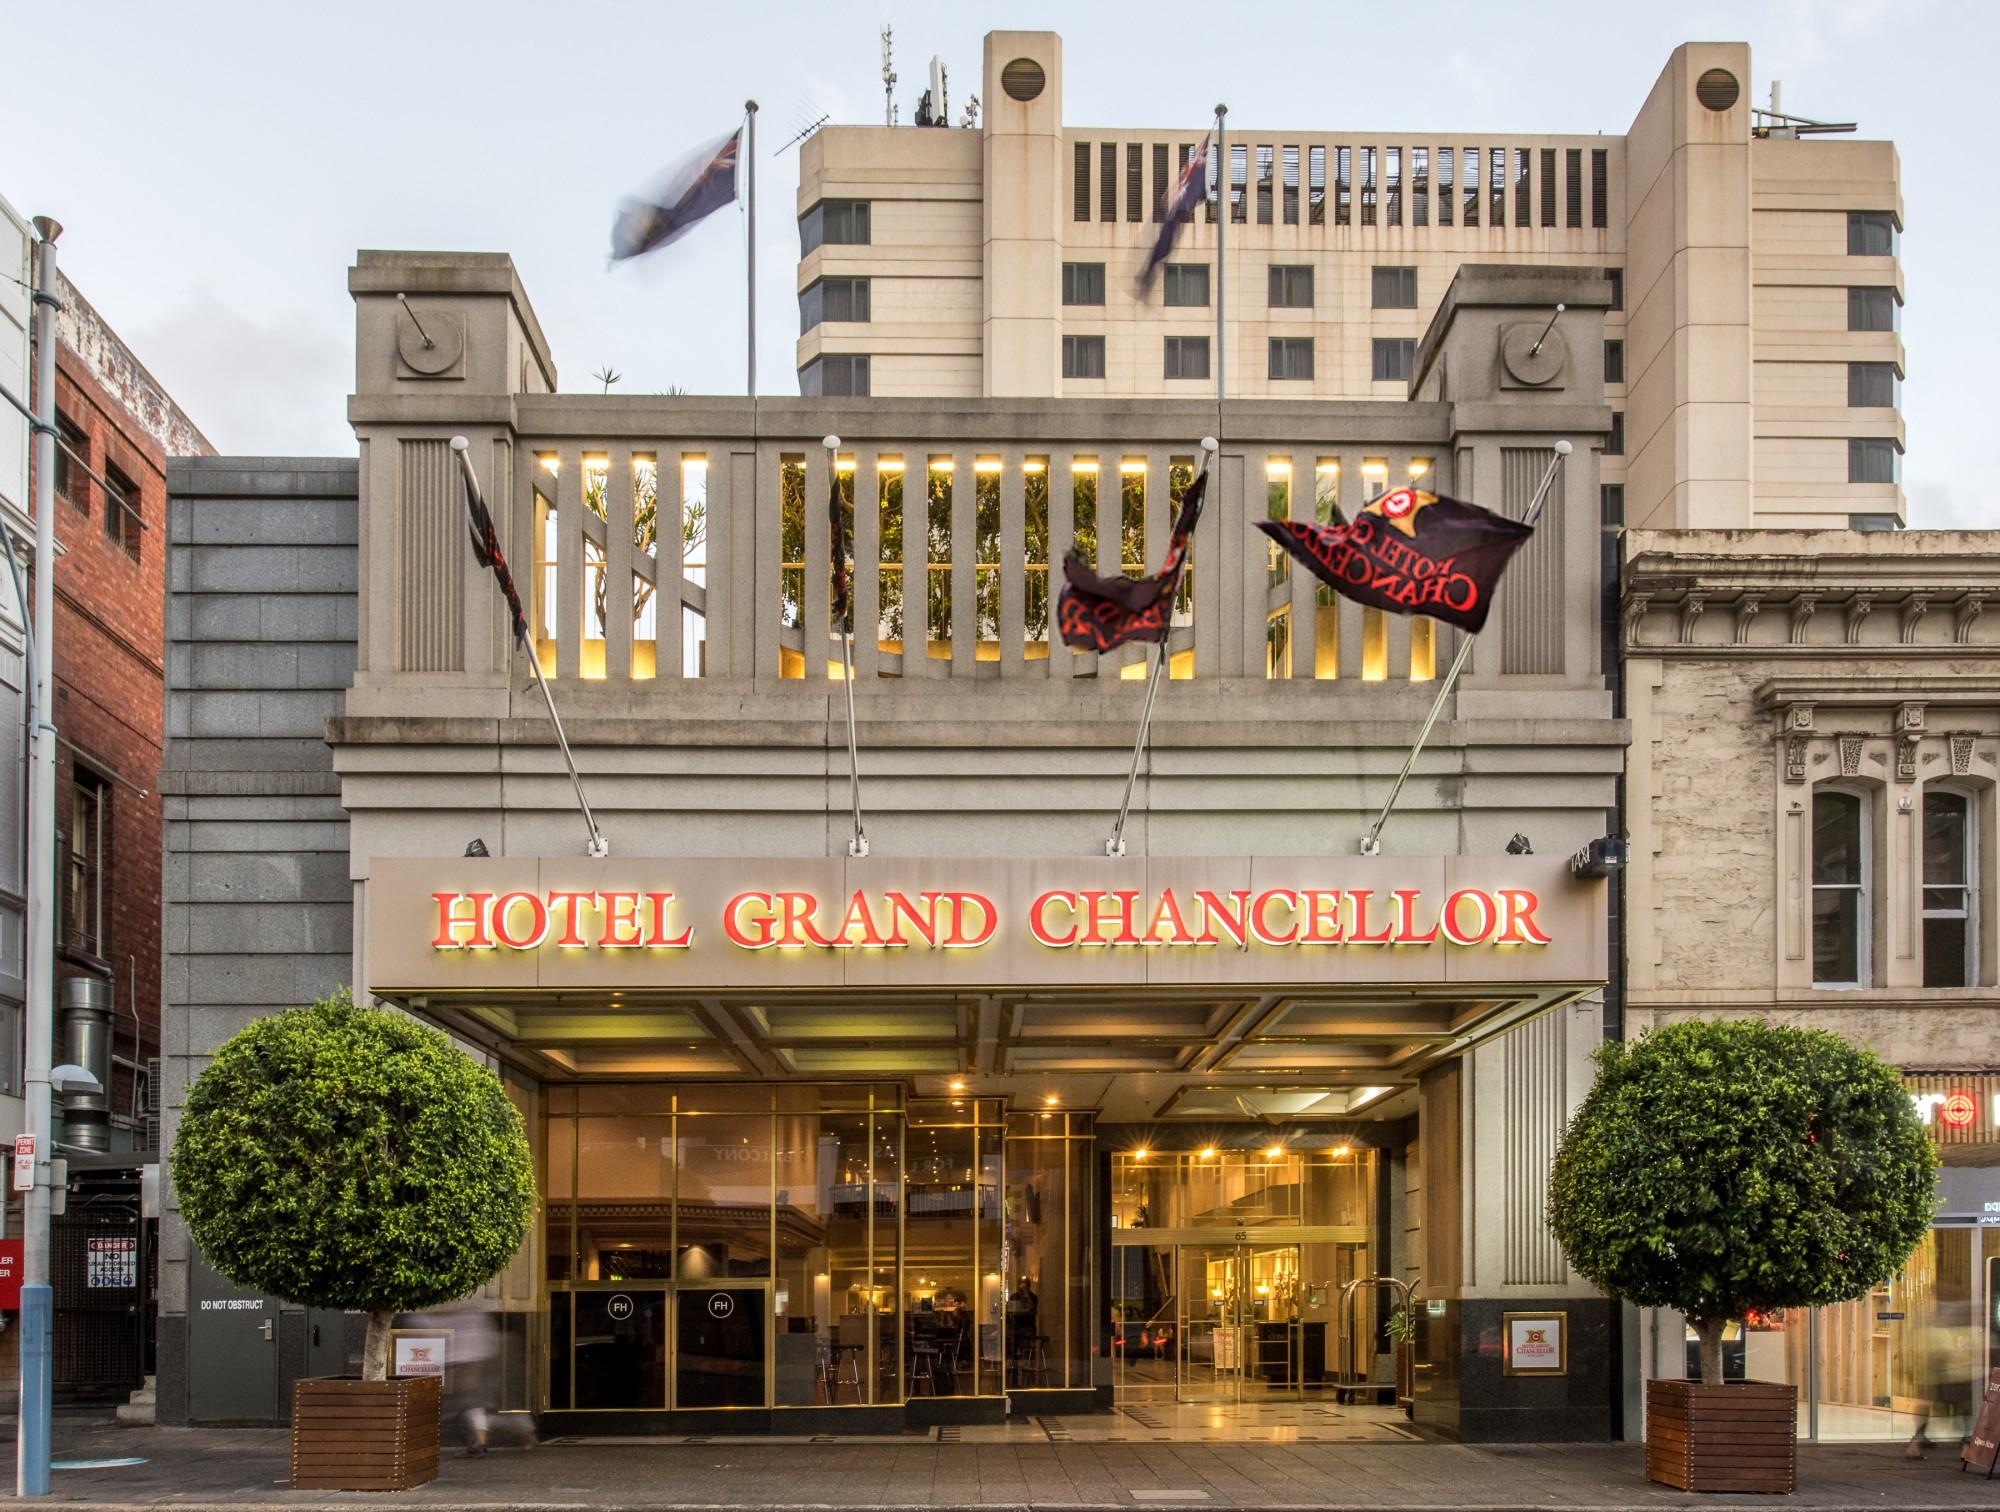 The Casino Adelaide